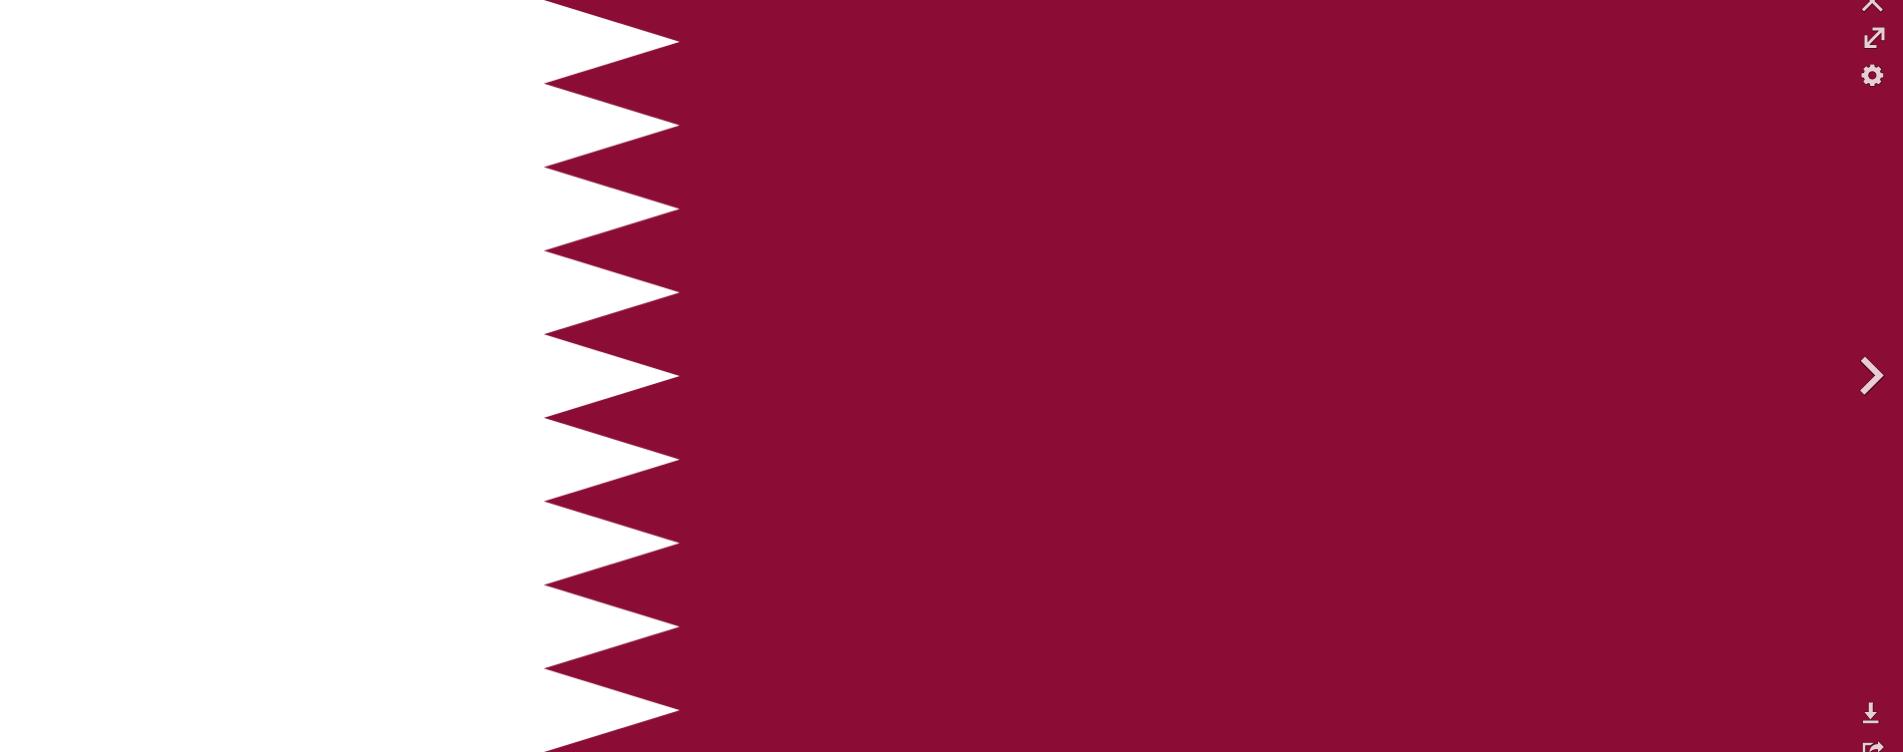 Flagge im Querformat Land Katar 150x100 cm